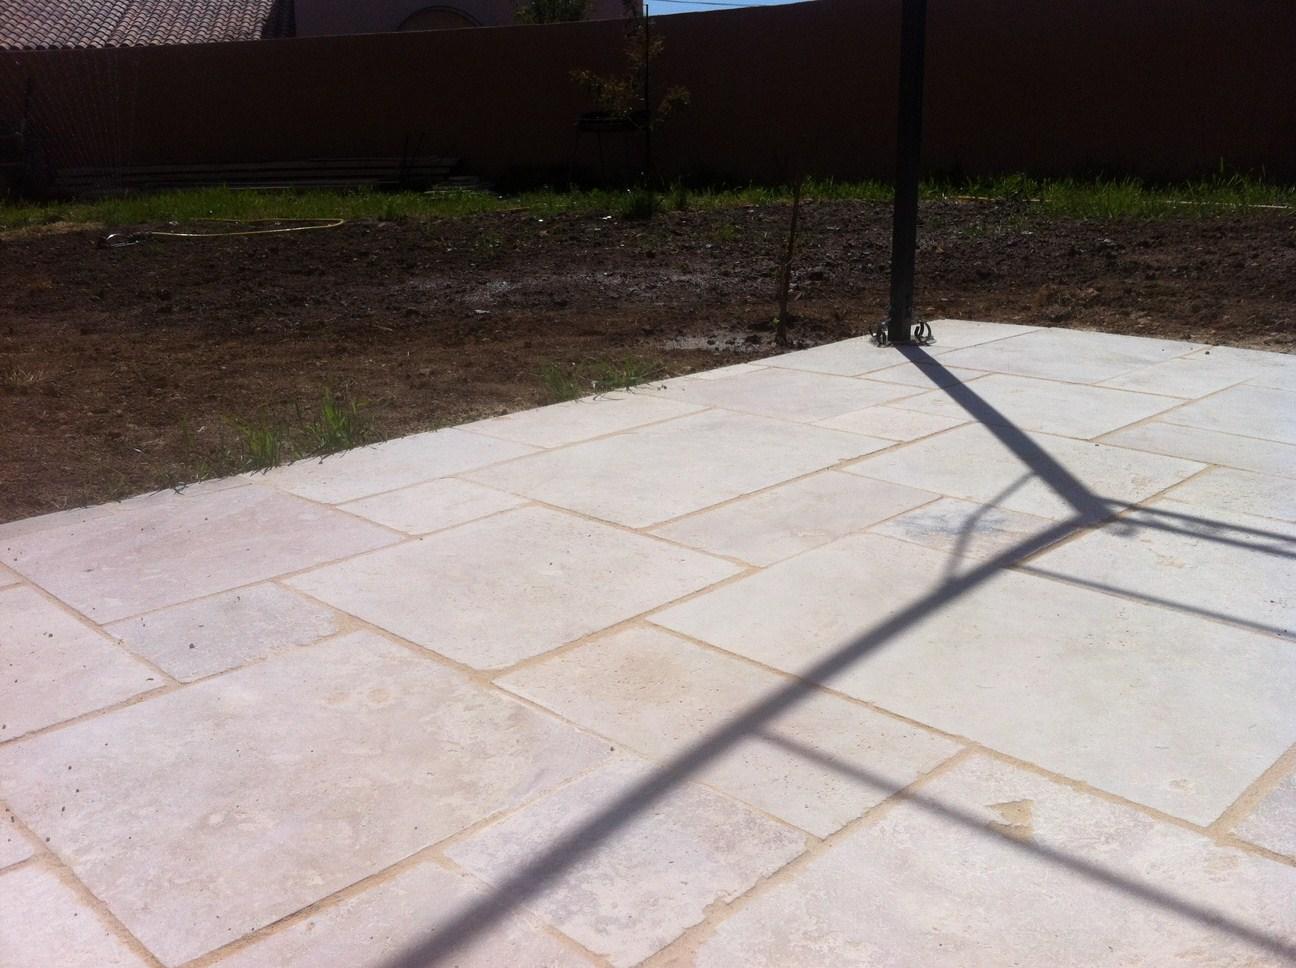 Joint travertin salle de bain - Refaire joint carrelage terrasse ...